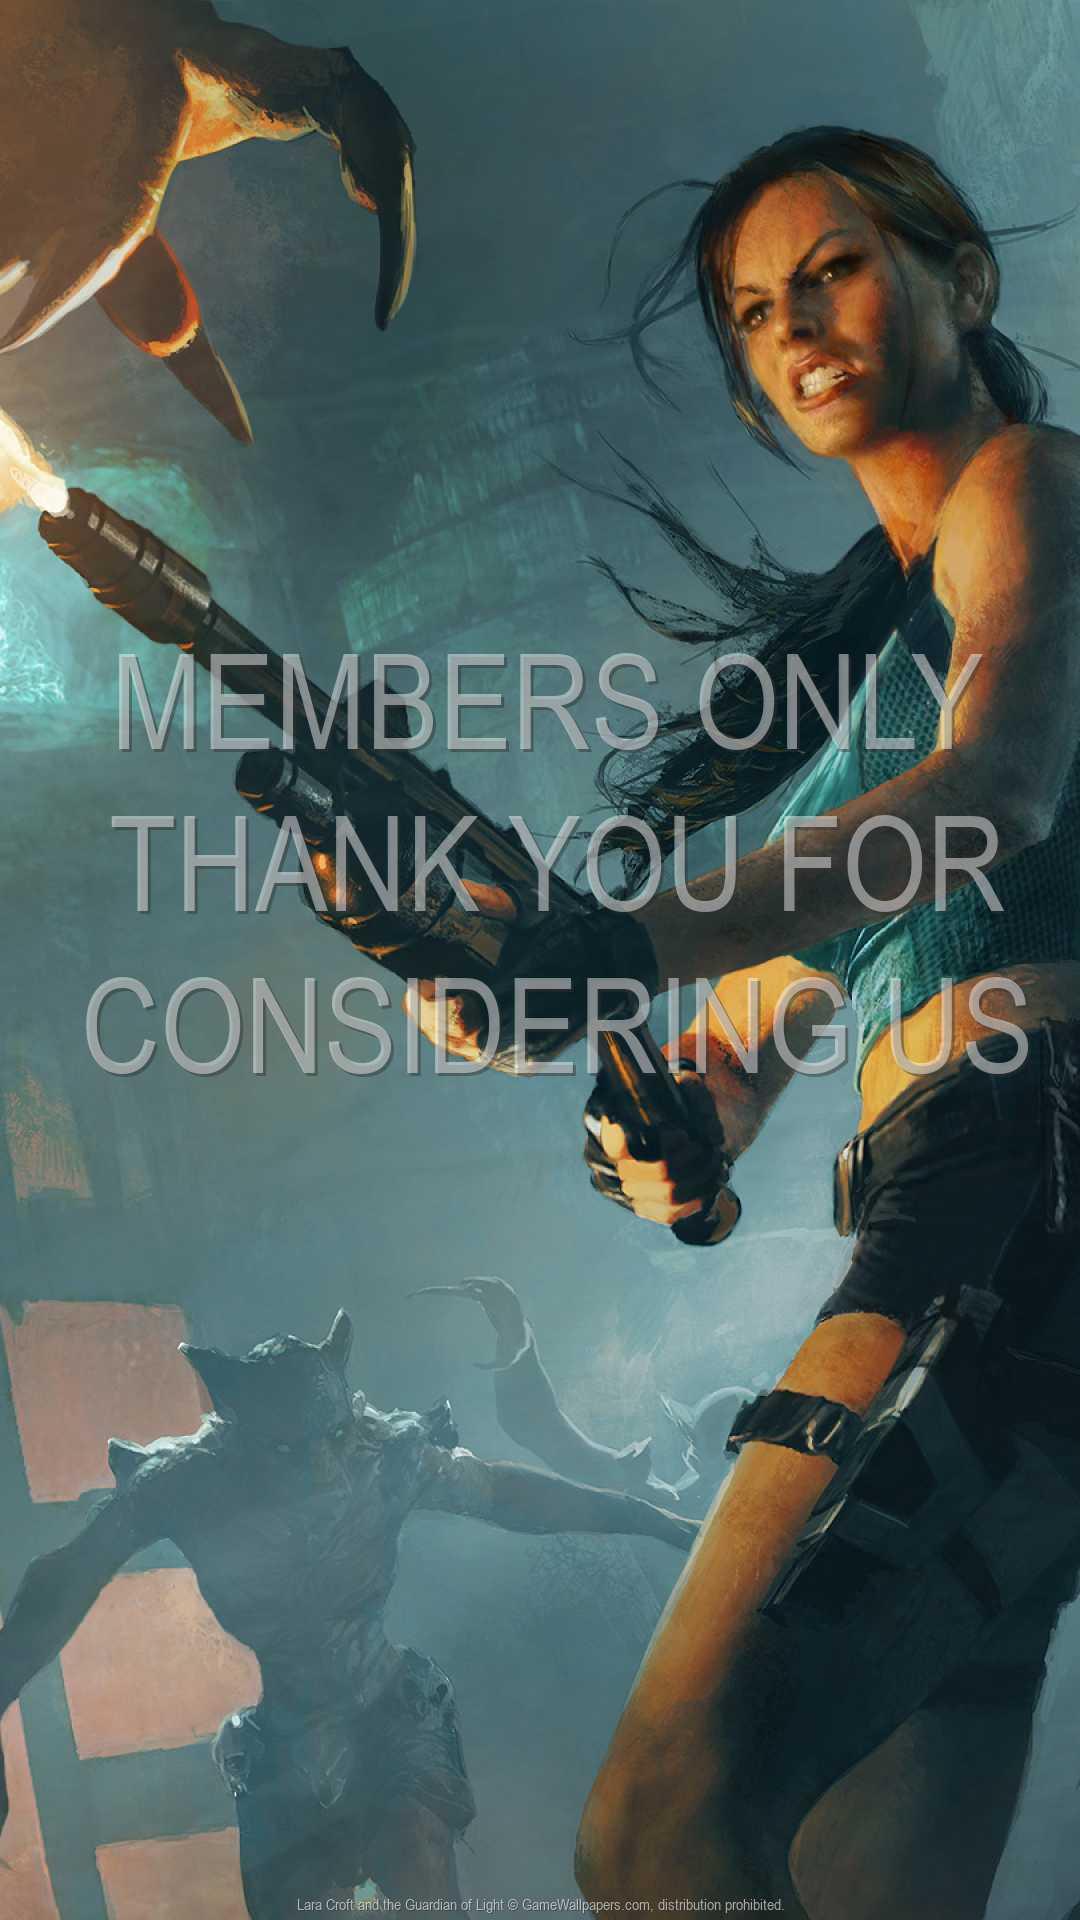 Lara Croft and the Guardian of Light 1080p Vertical Handy Hintergrundbild 02